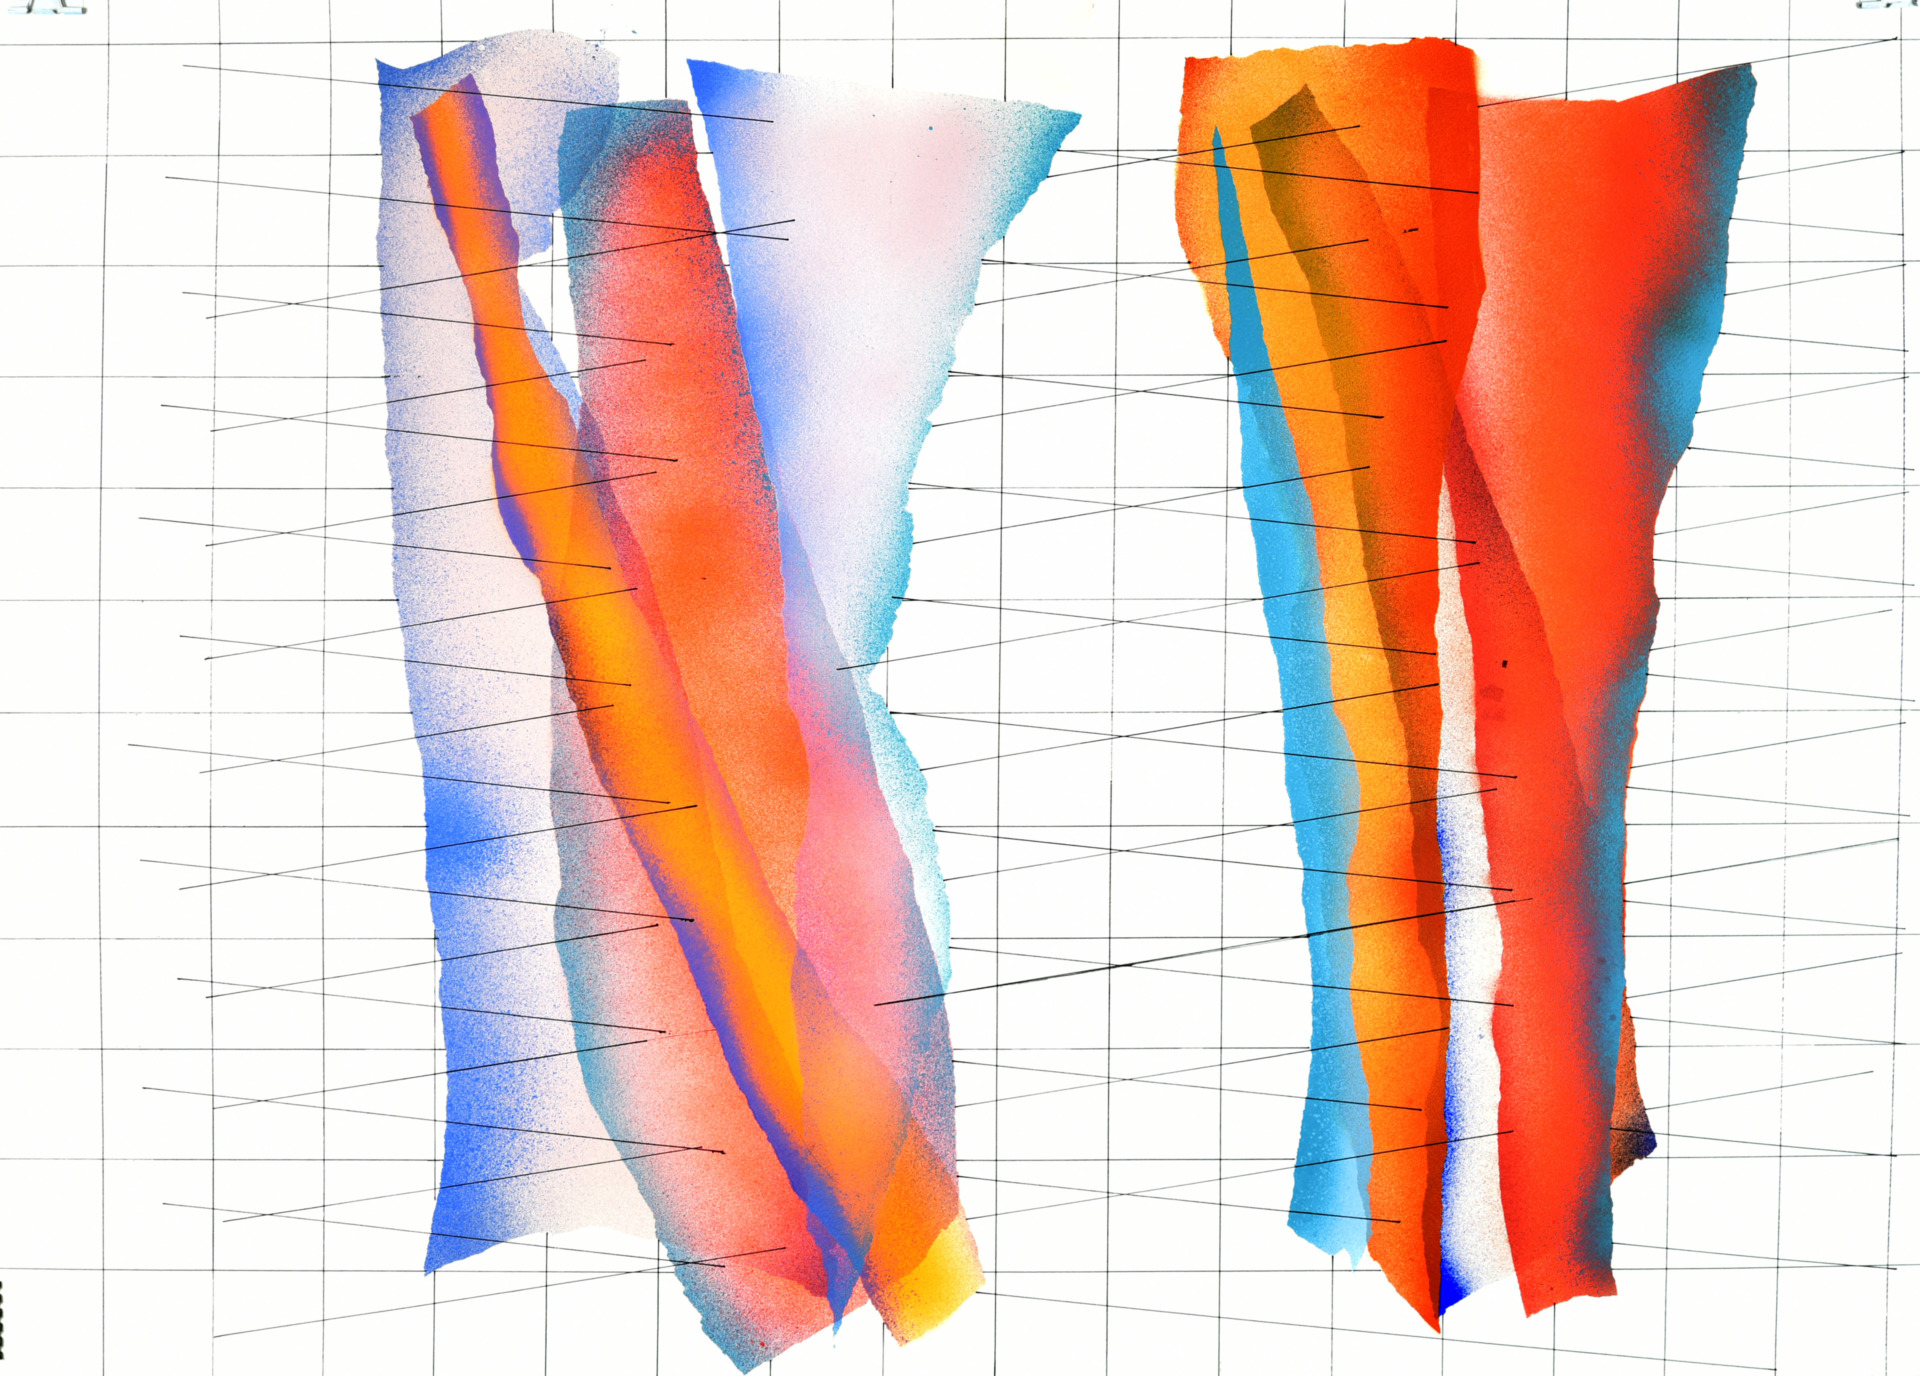 op. 231219. Acrylic on paper, 105 x 75 cm, 2019